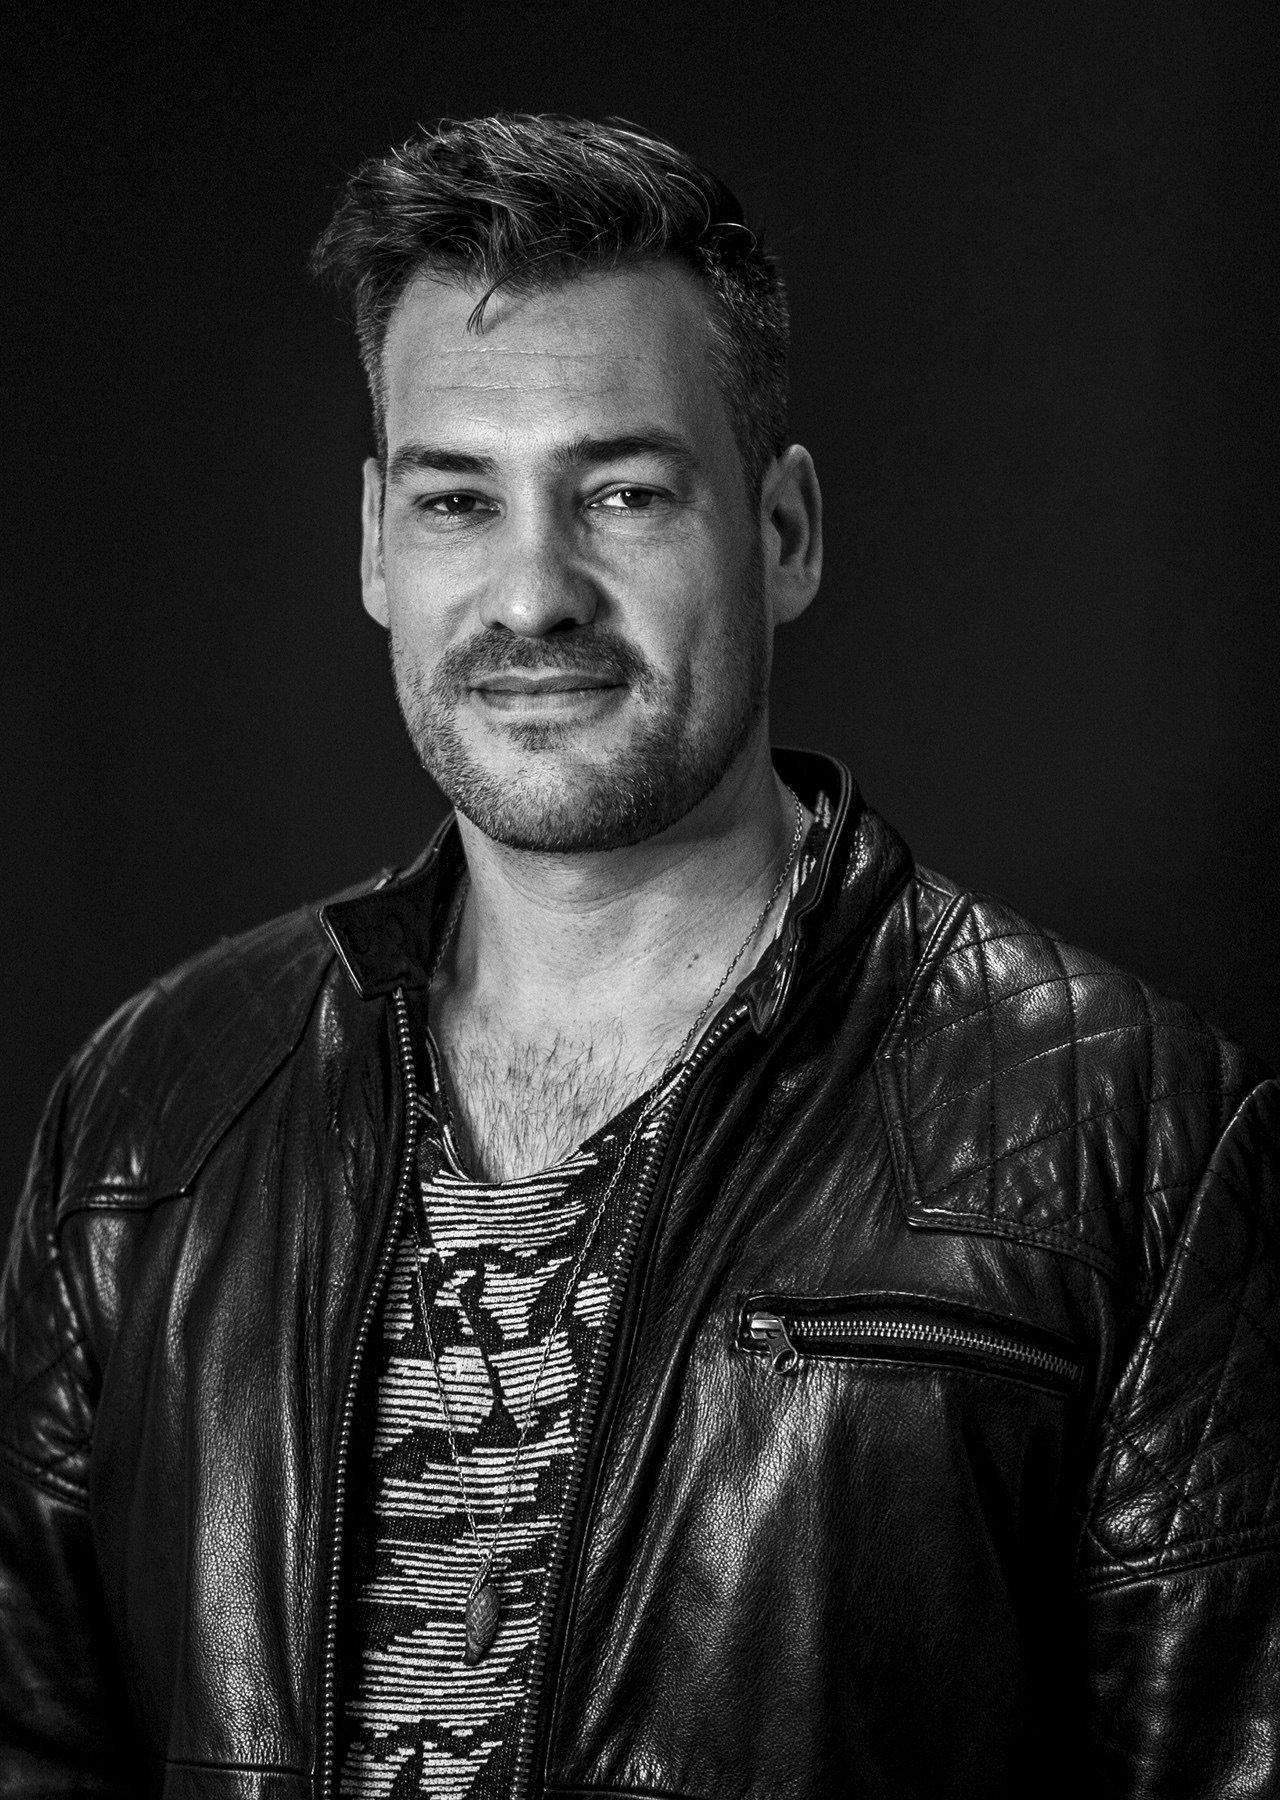 Michael Sieber